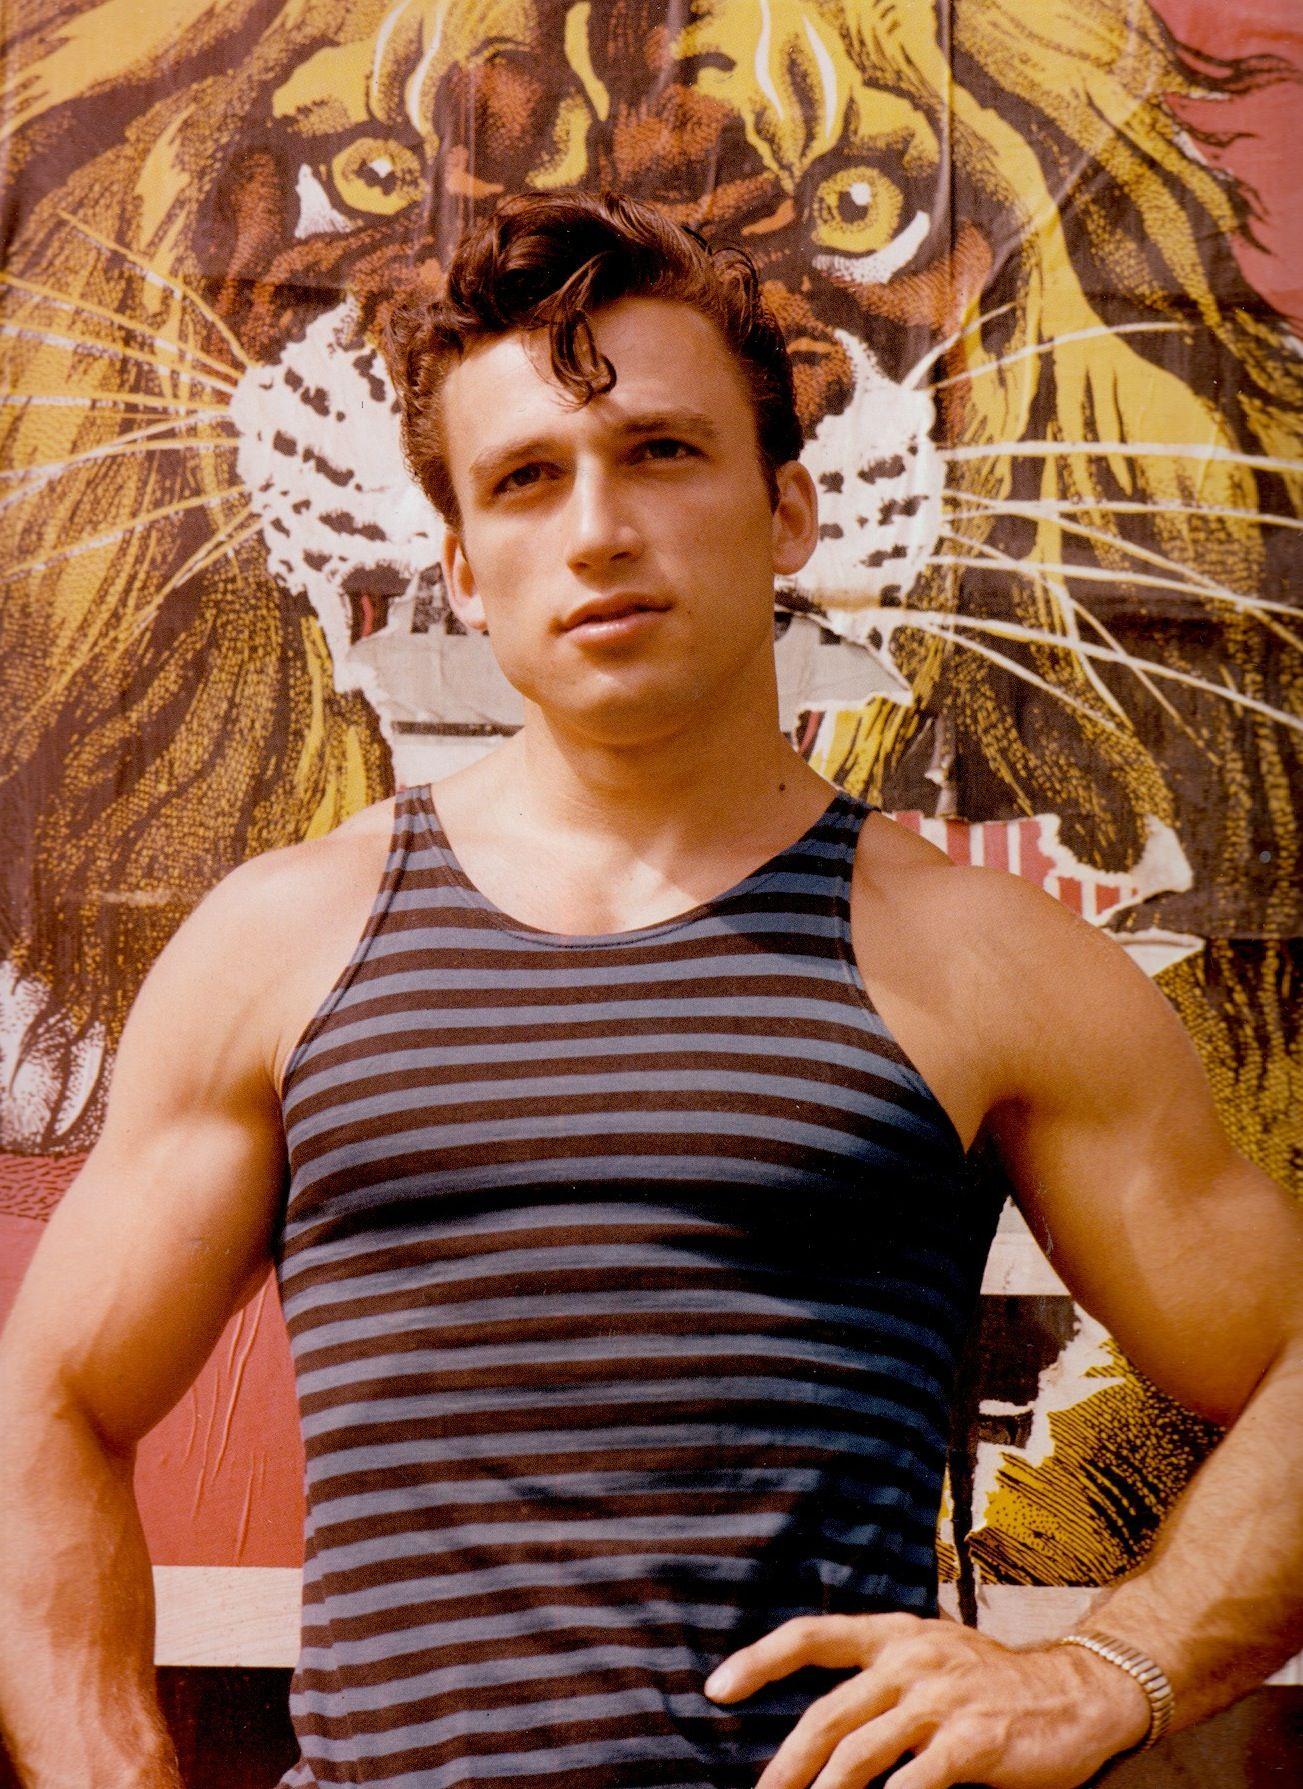 Danny Fitzgerald and Les Demi Dieux: Brooklyn Boys